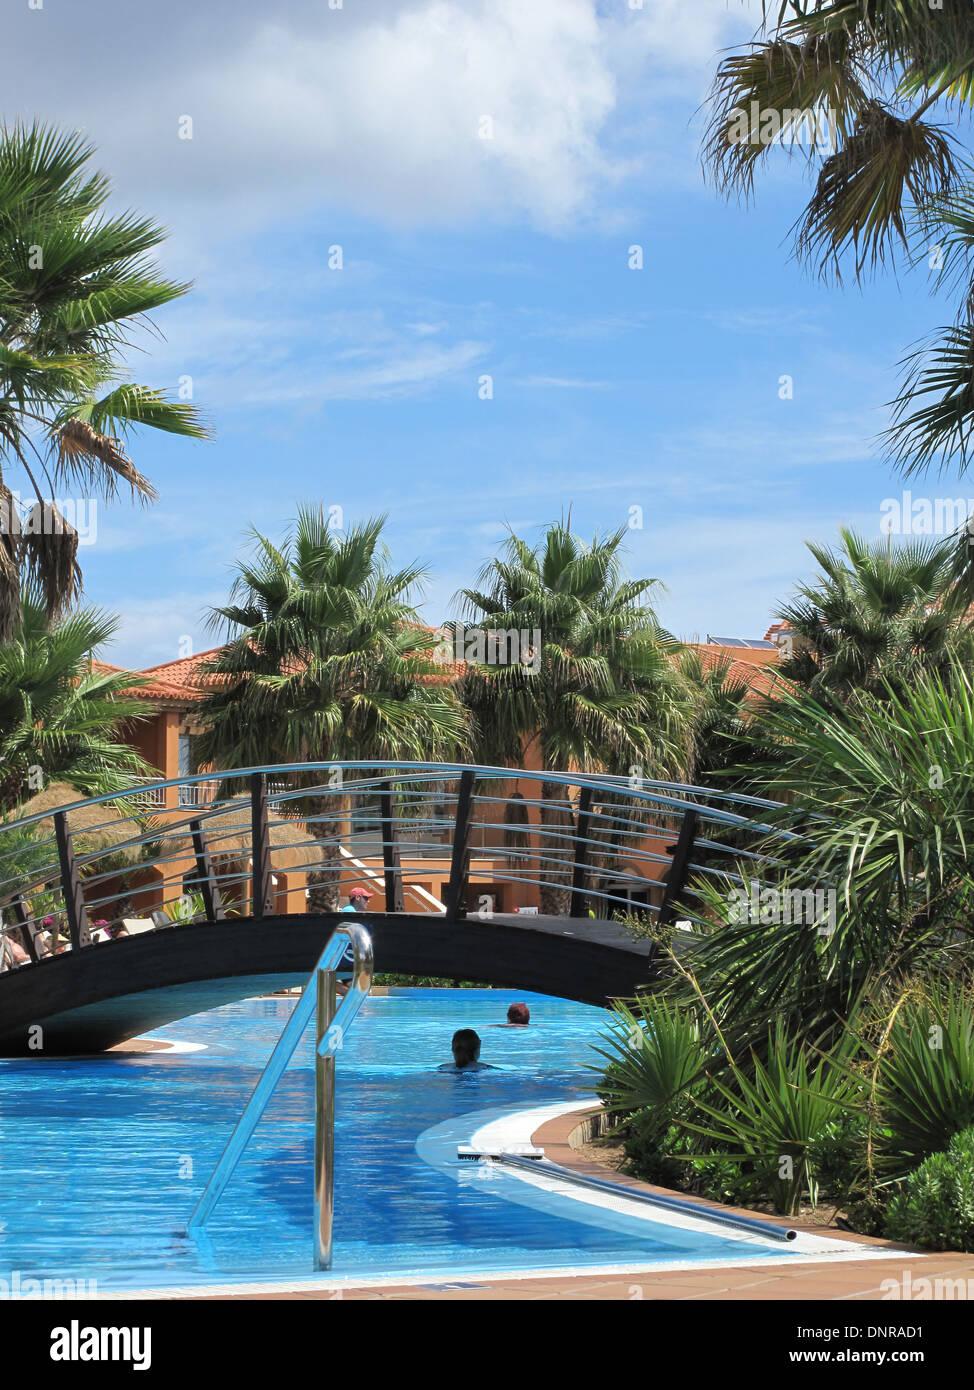 The pool at the Pestana hotel on the Island of Porto Santo Maderia - Stock Image